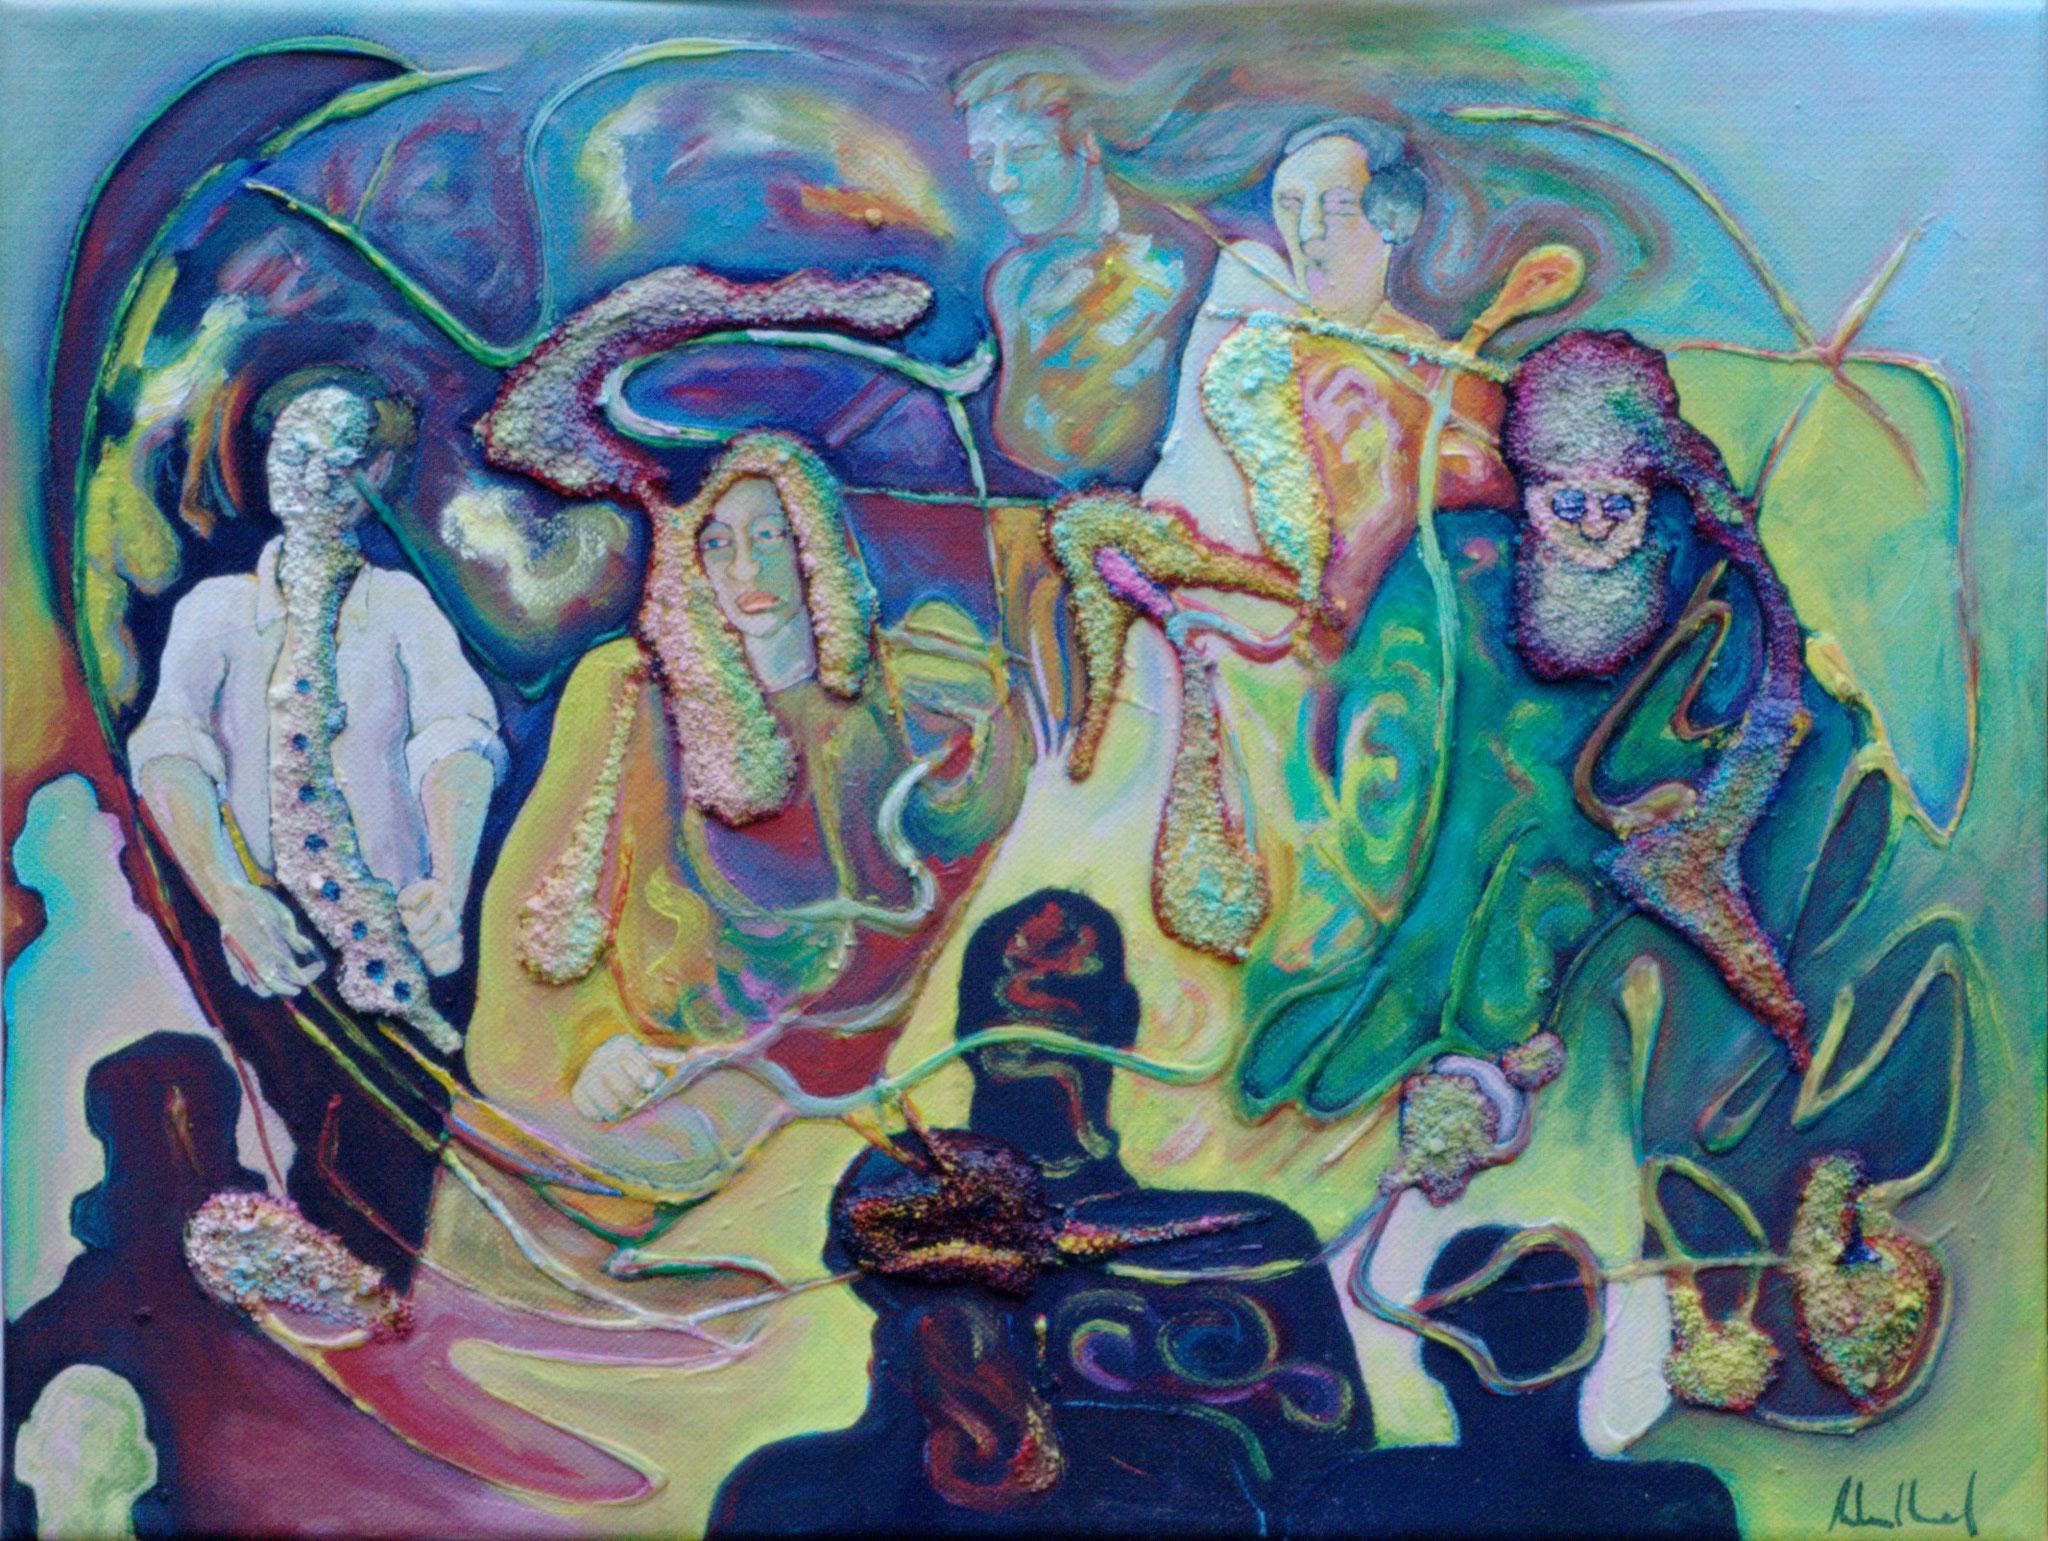 Wabernde Klänge · 2016 · Acryl, Öl auf Nessel, 40 x 50 cm